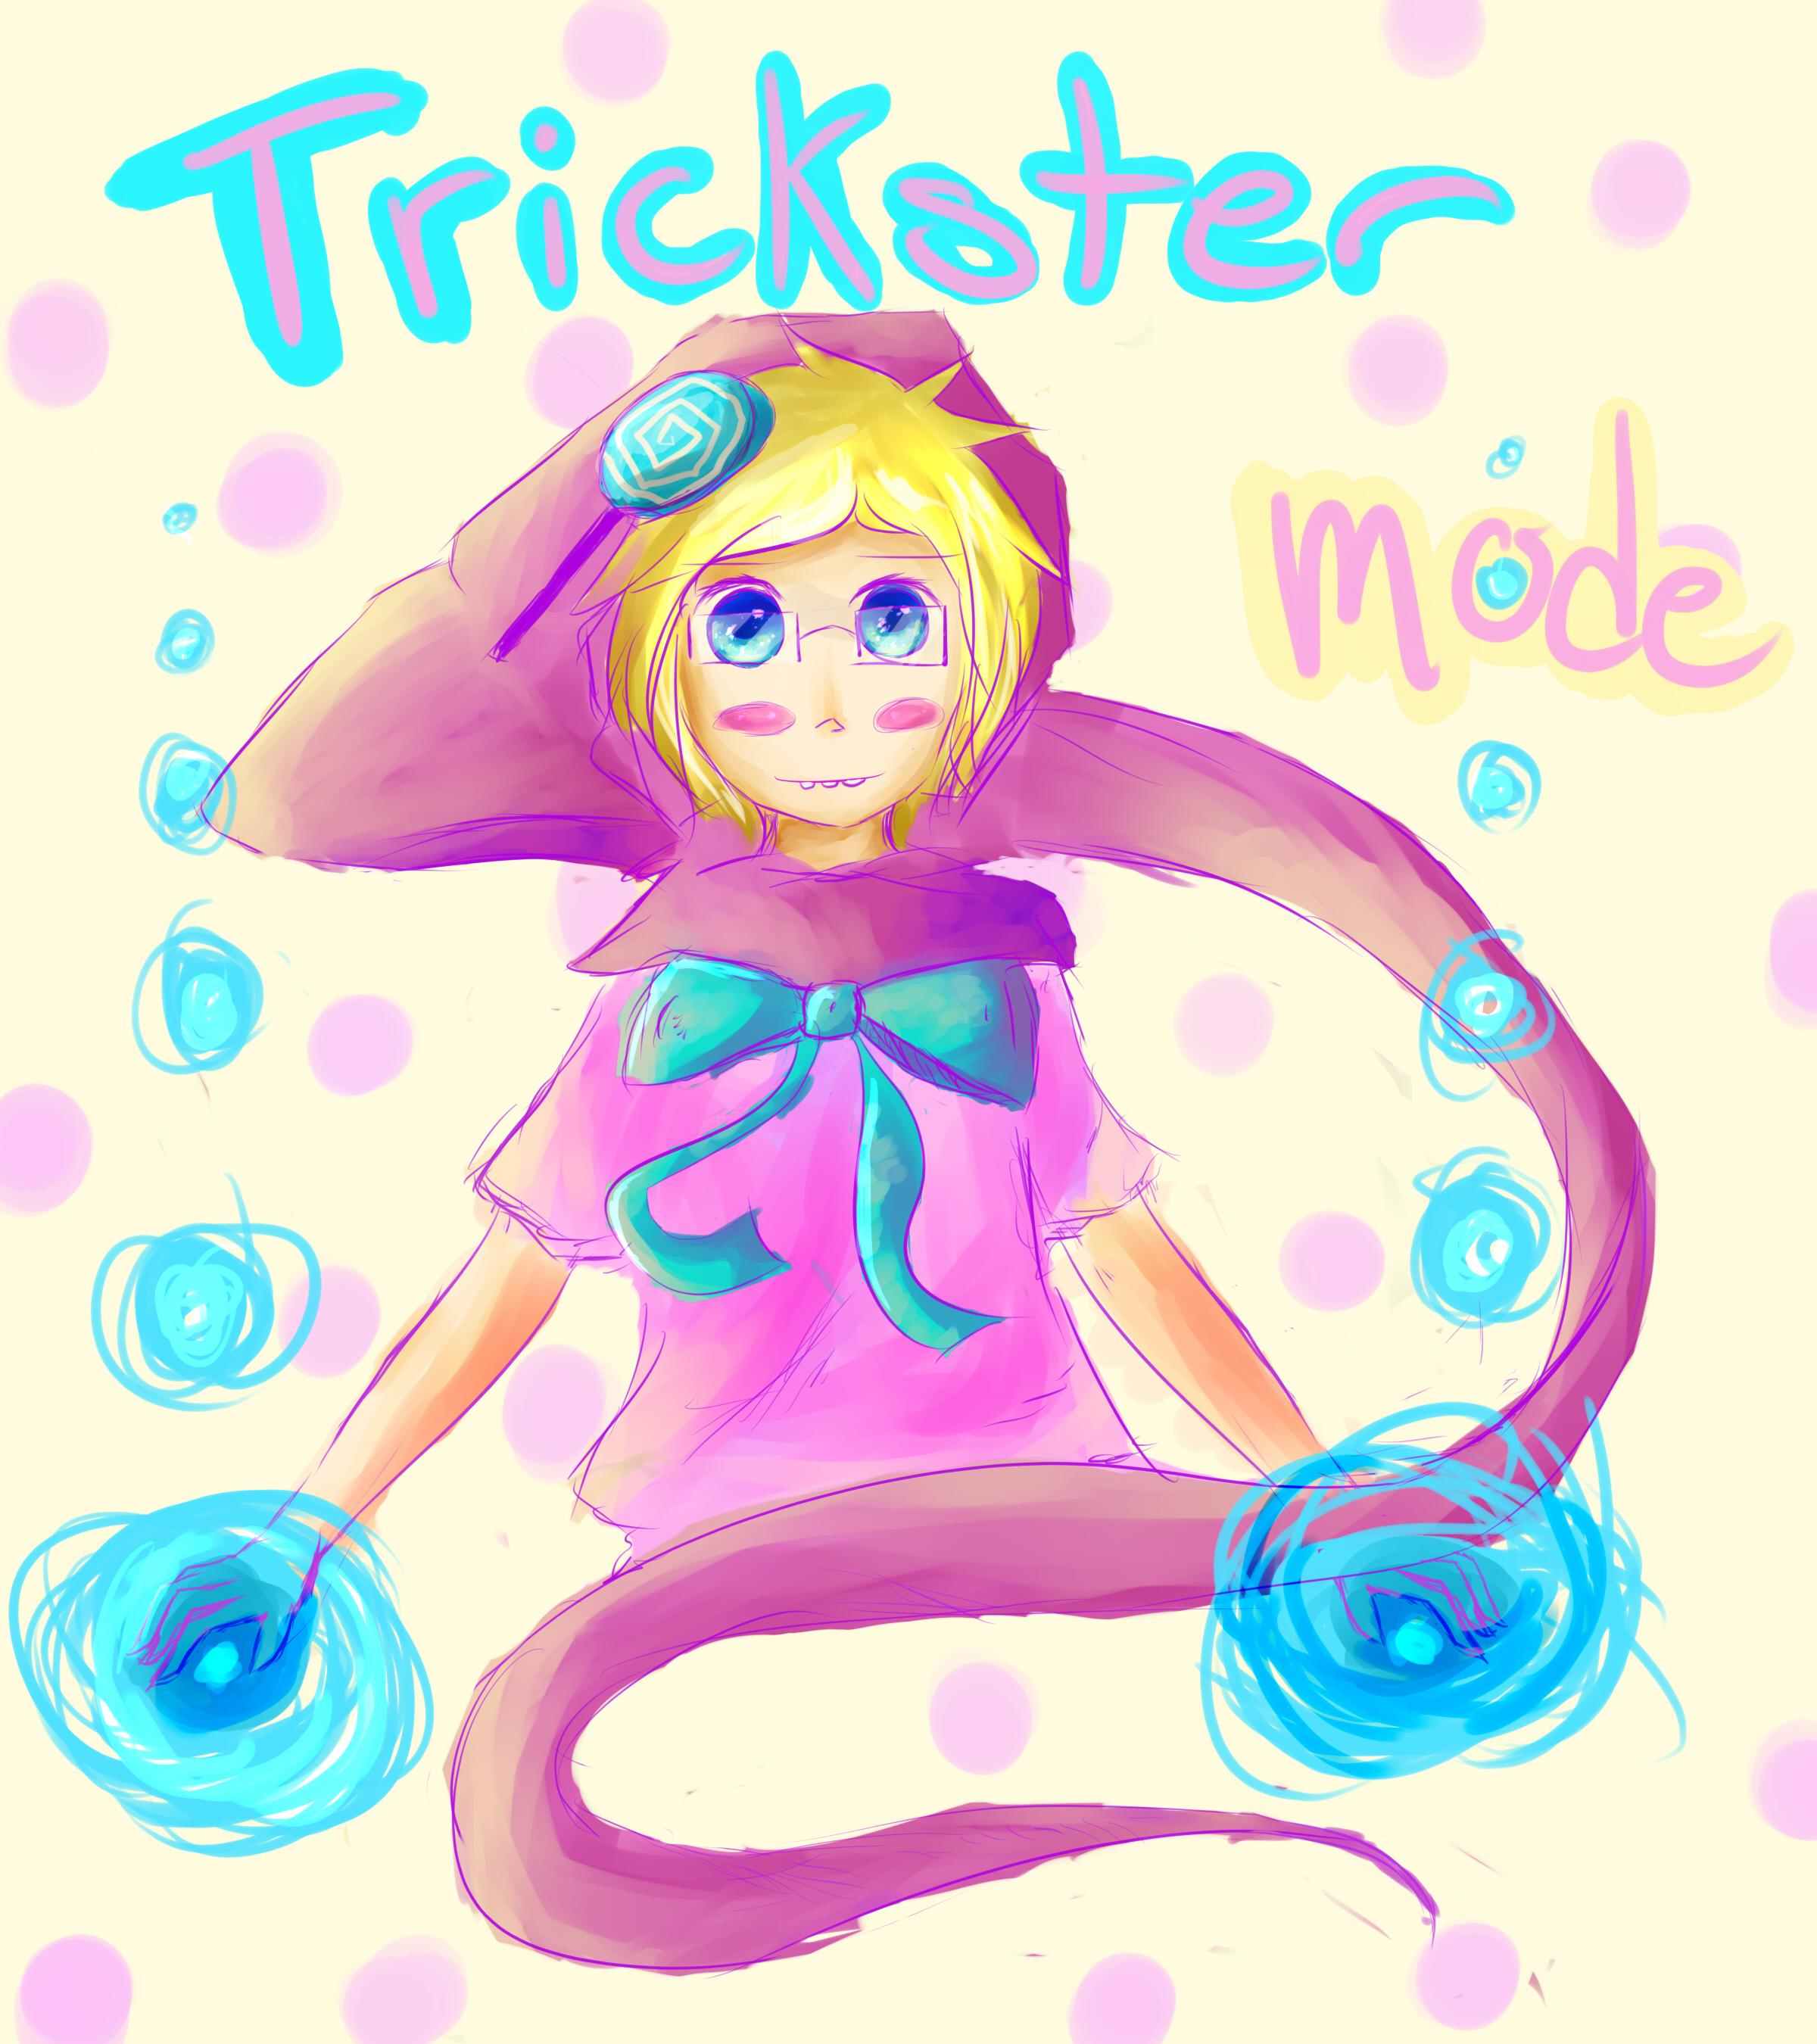 ticster